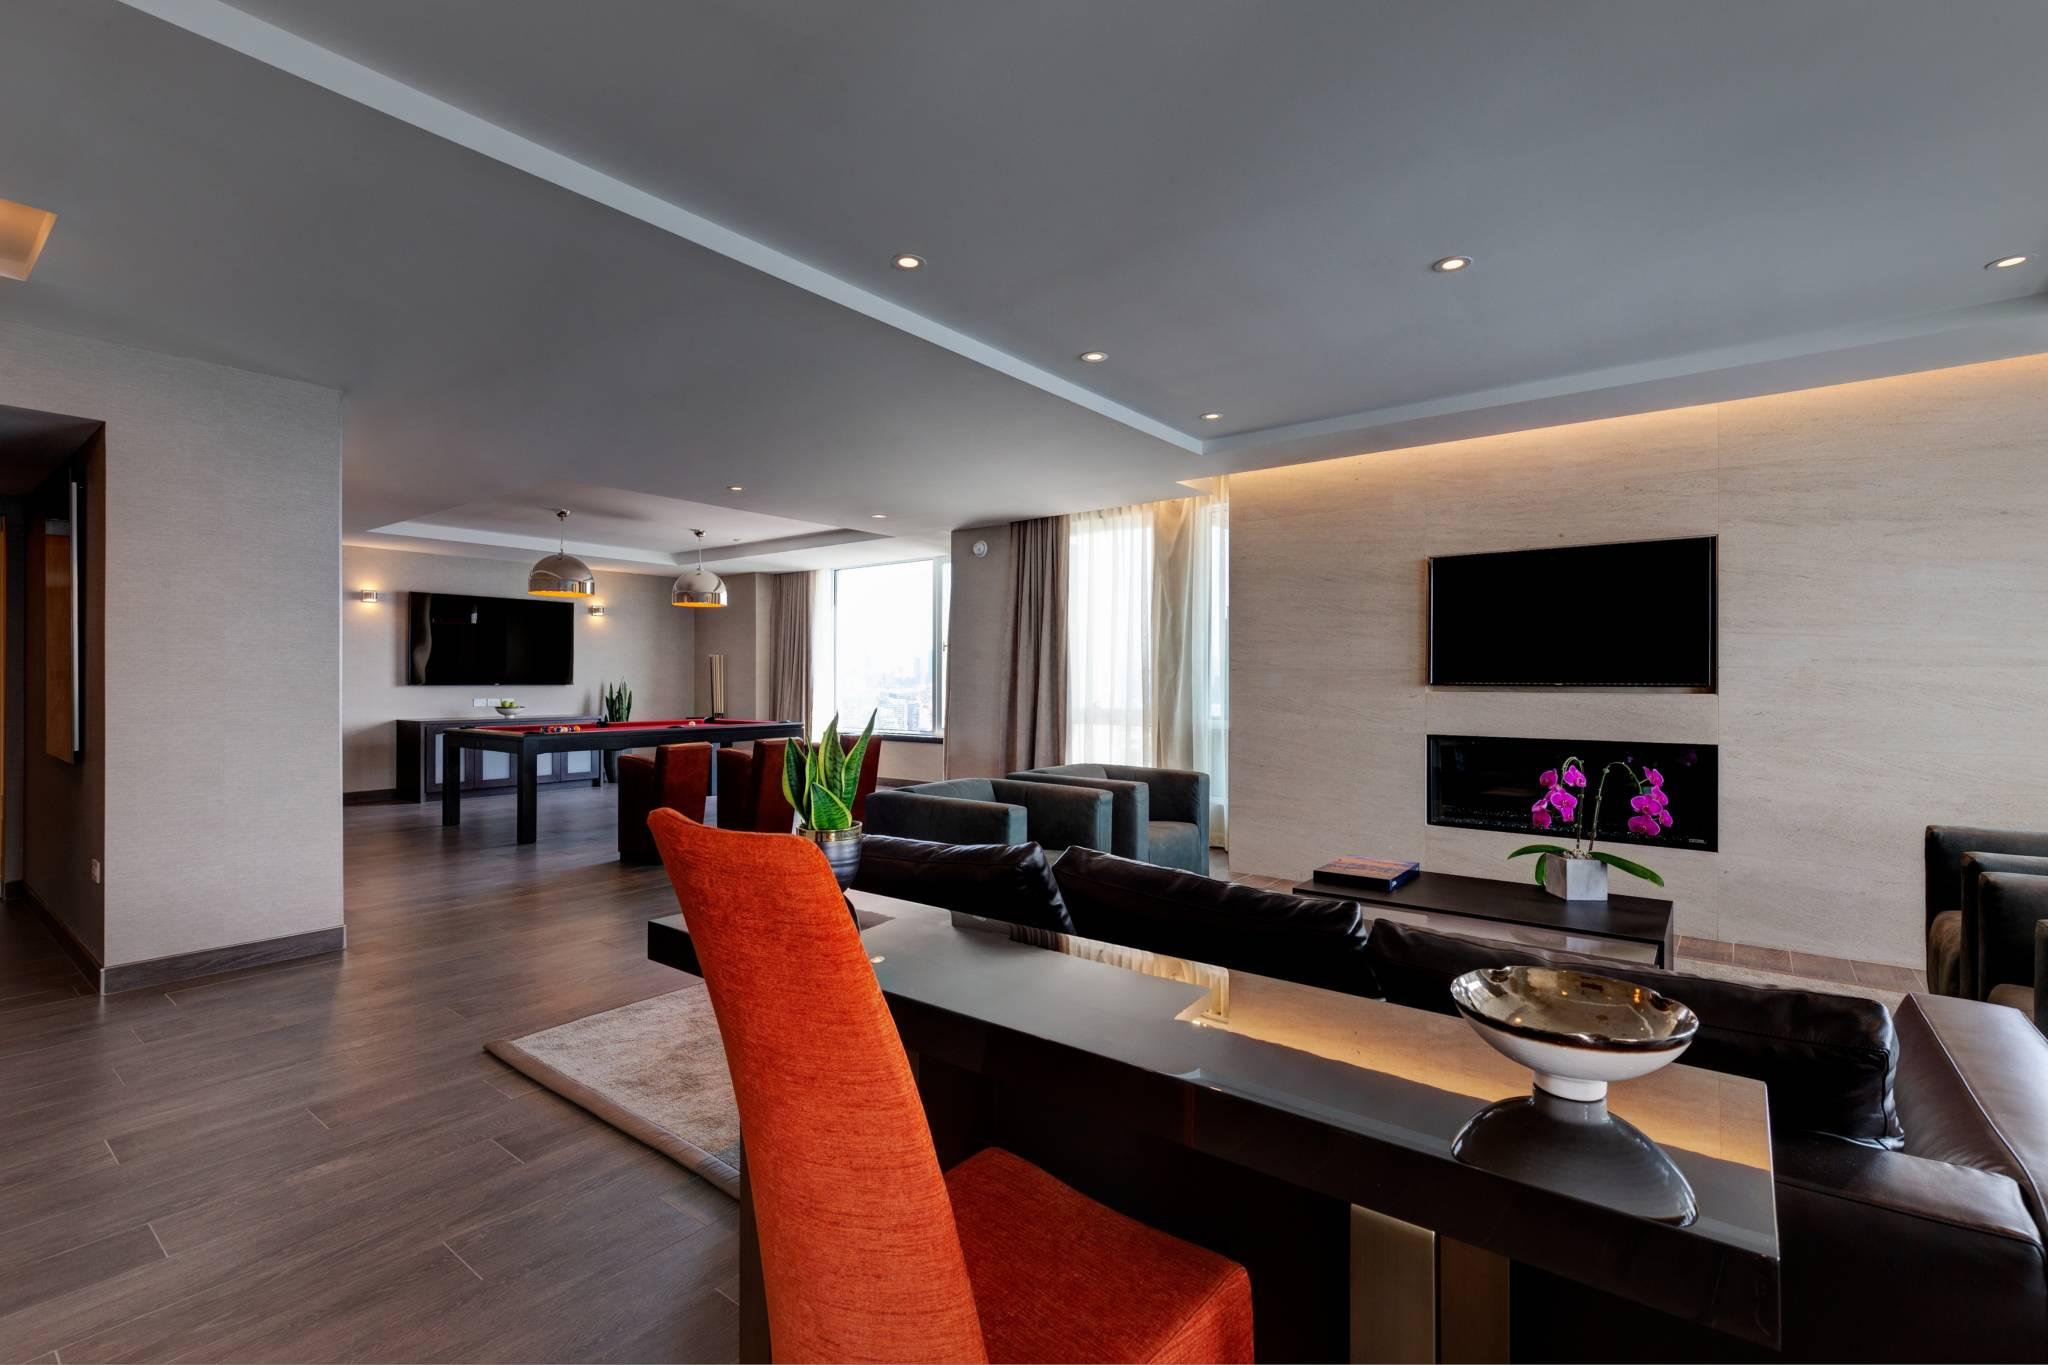 6000 a night toronto hotel x 8